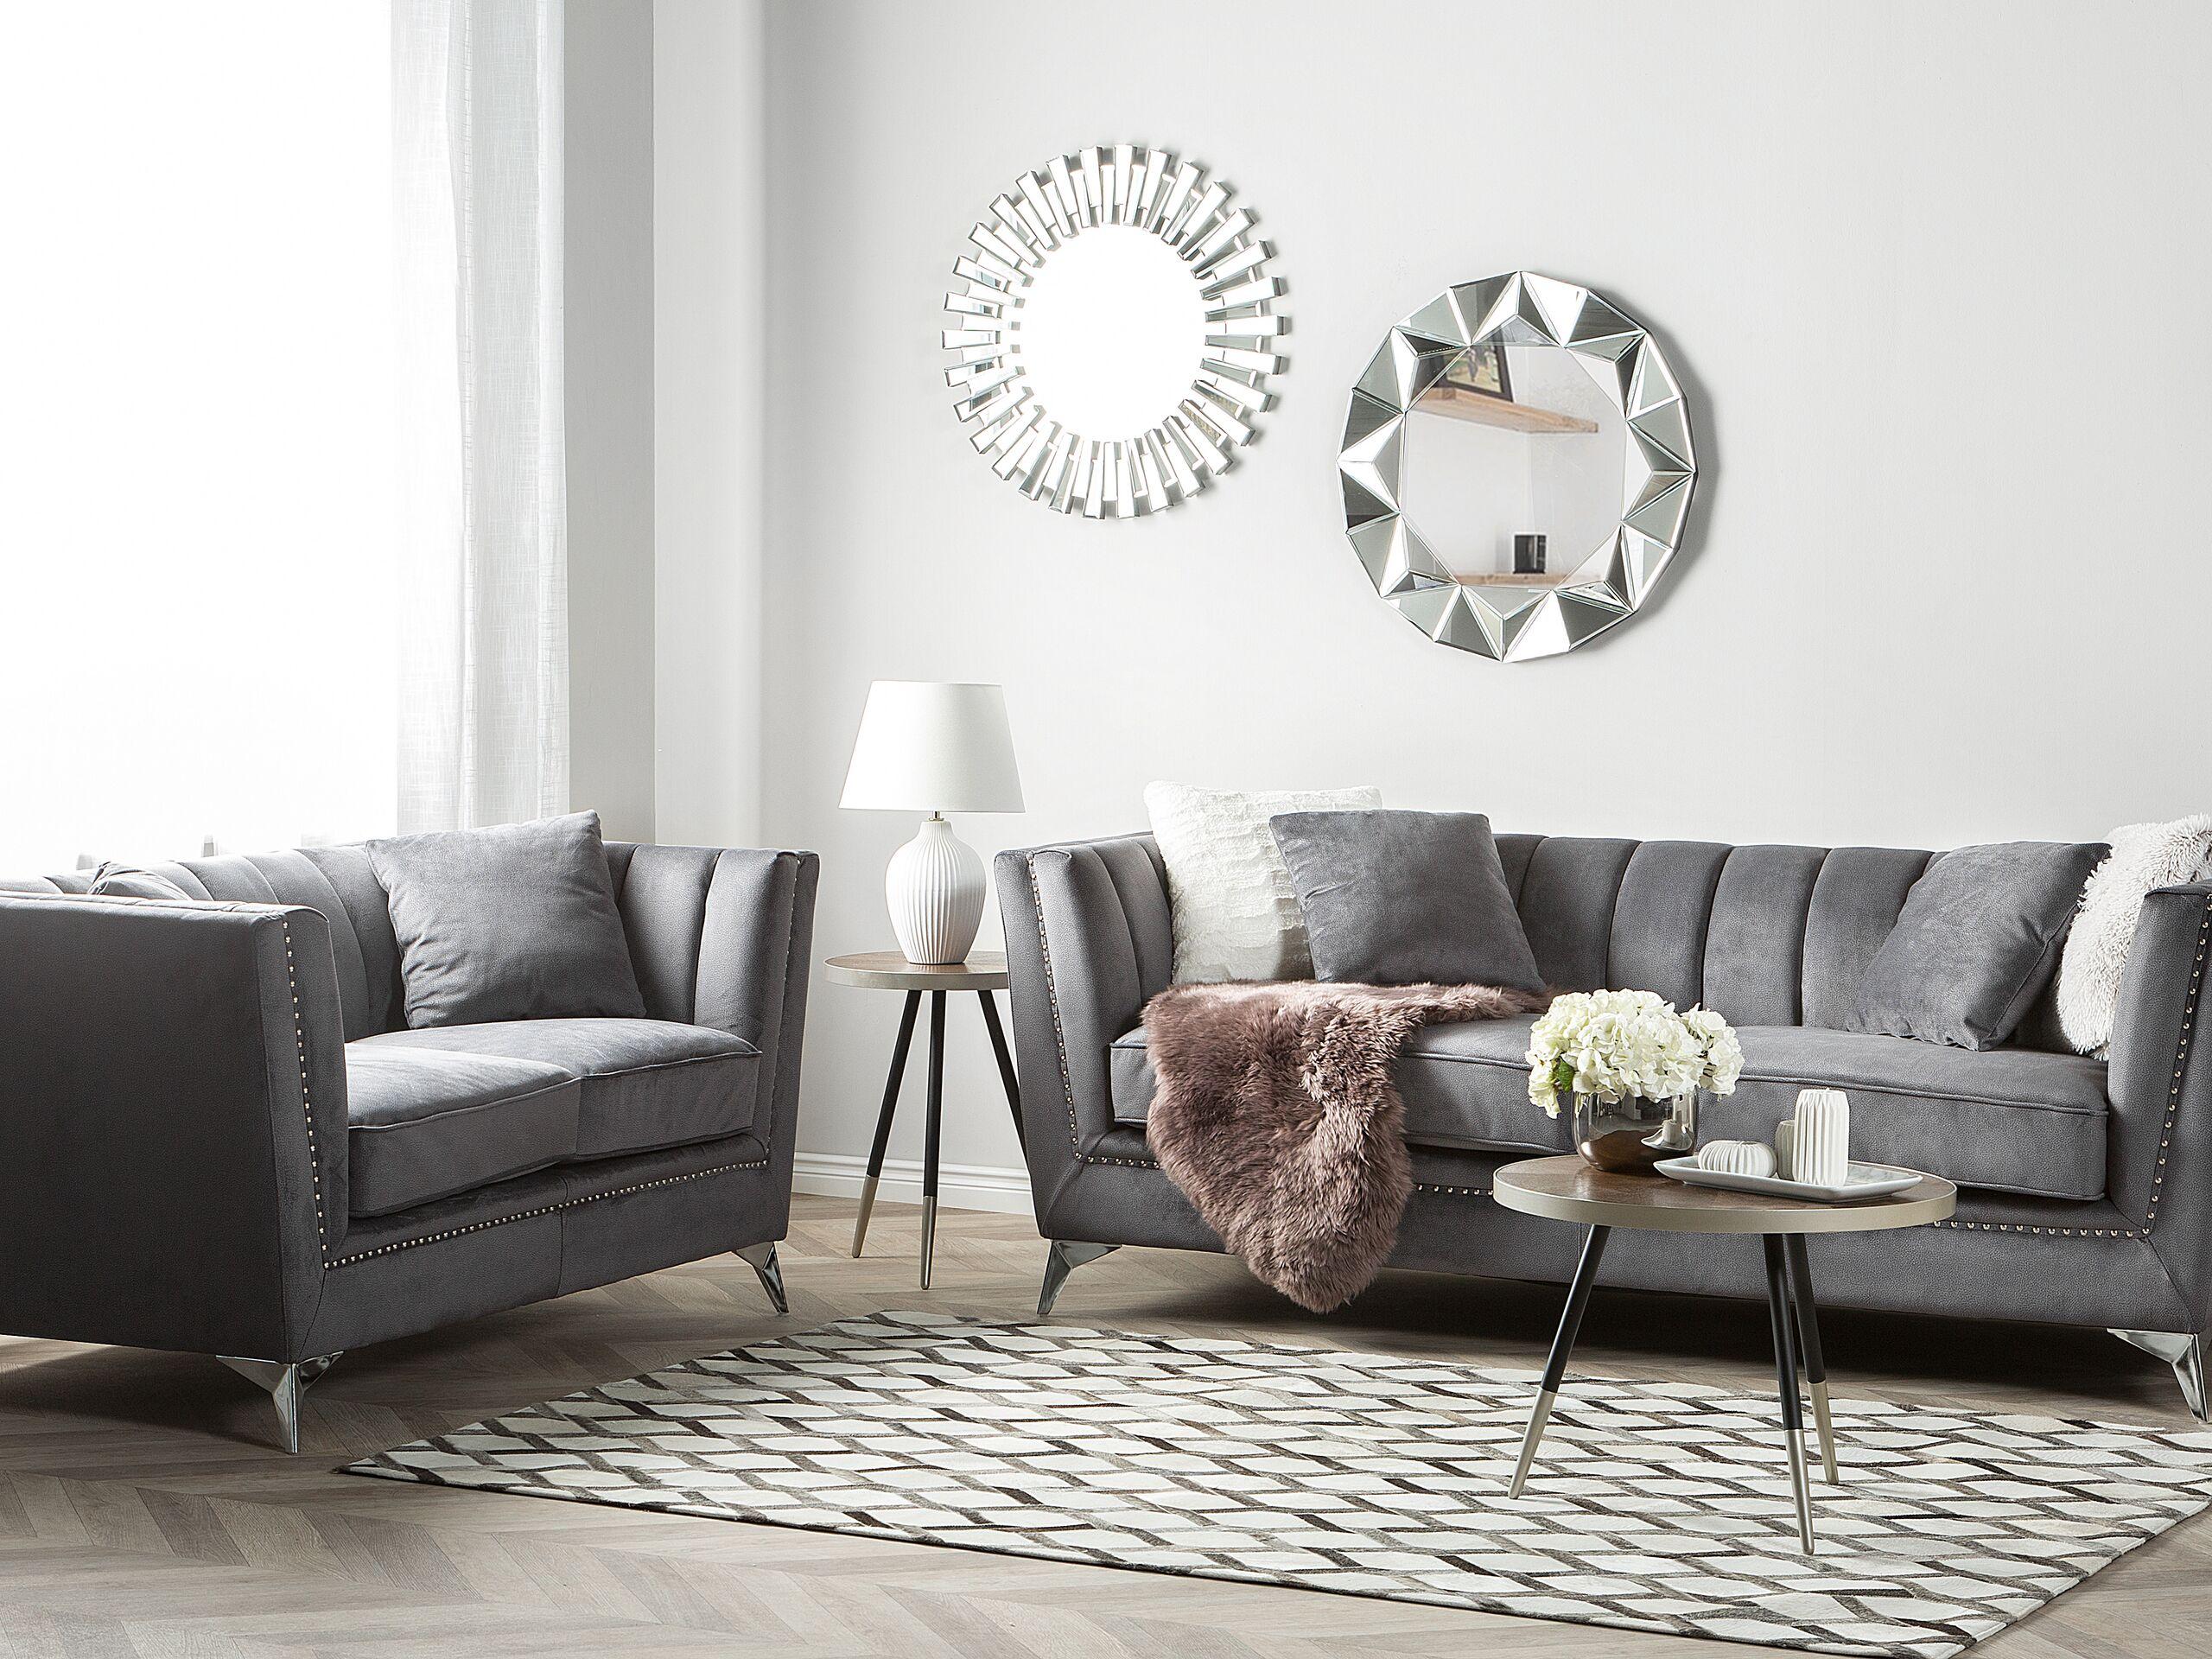 beliani set divani 5 posti in velluto grigio